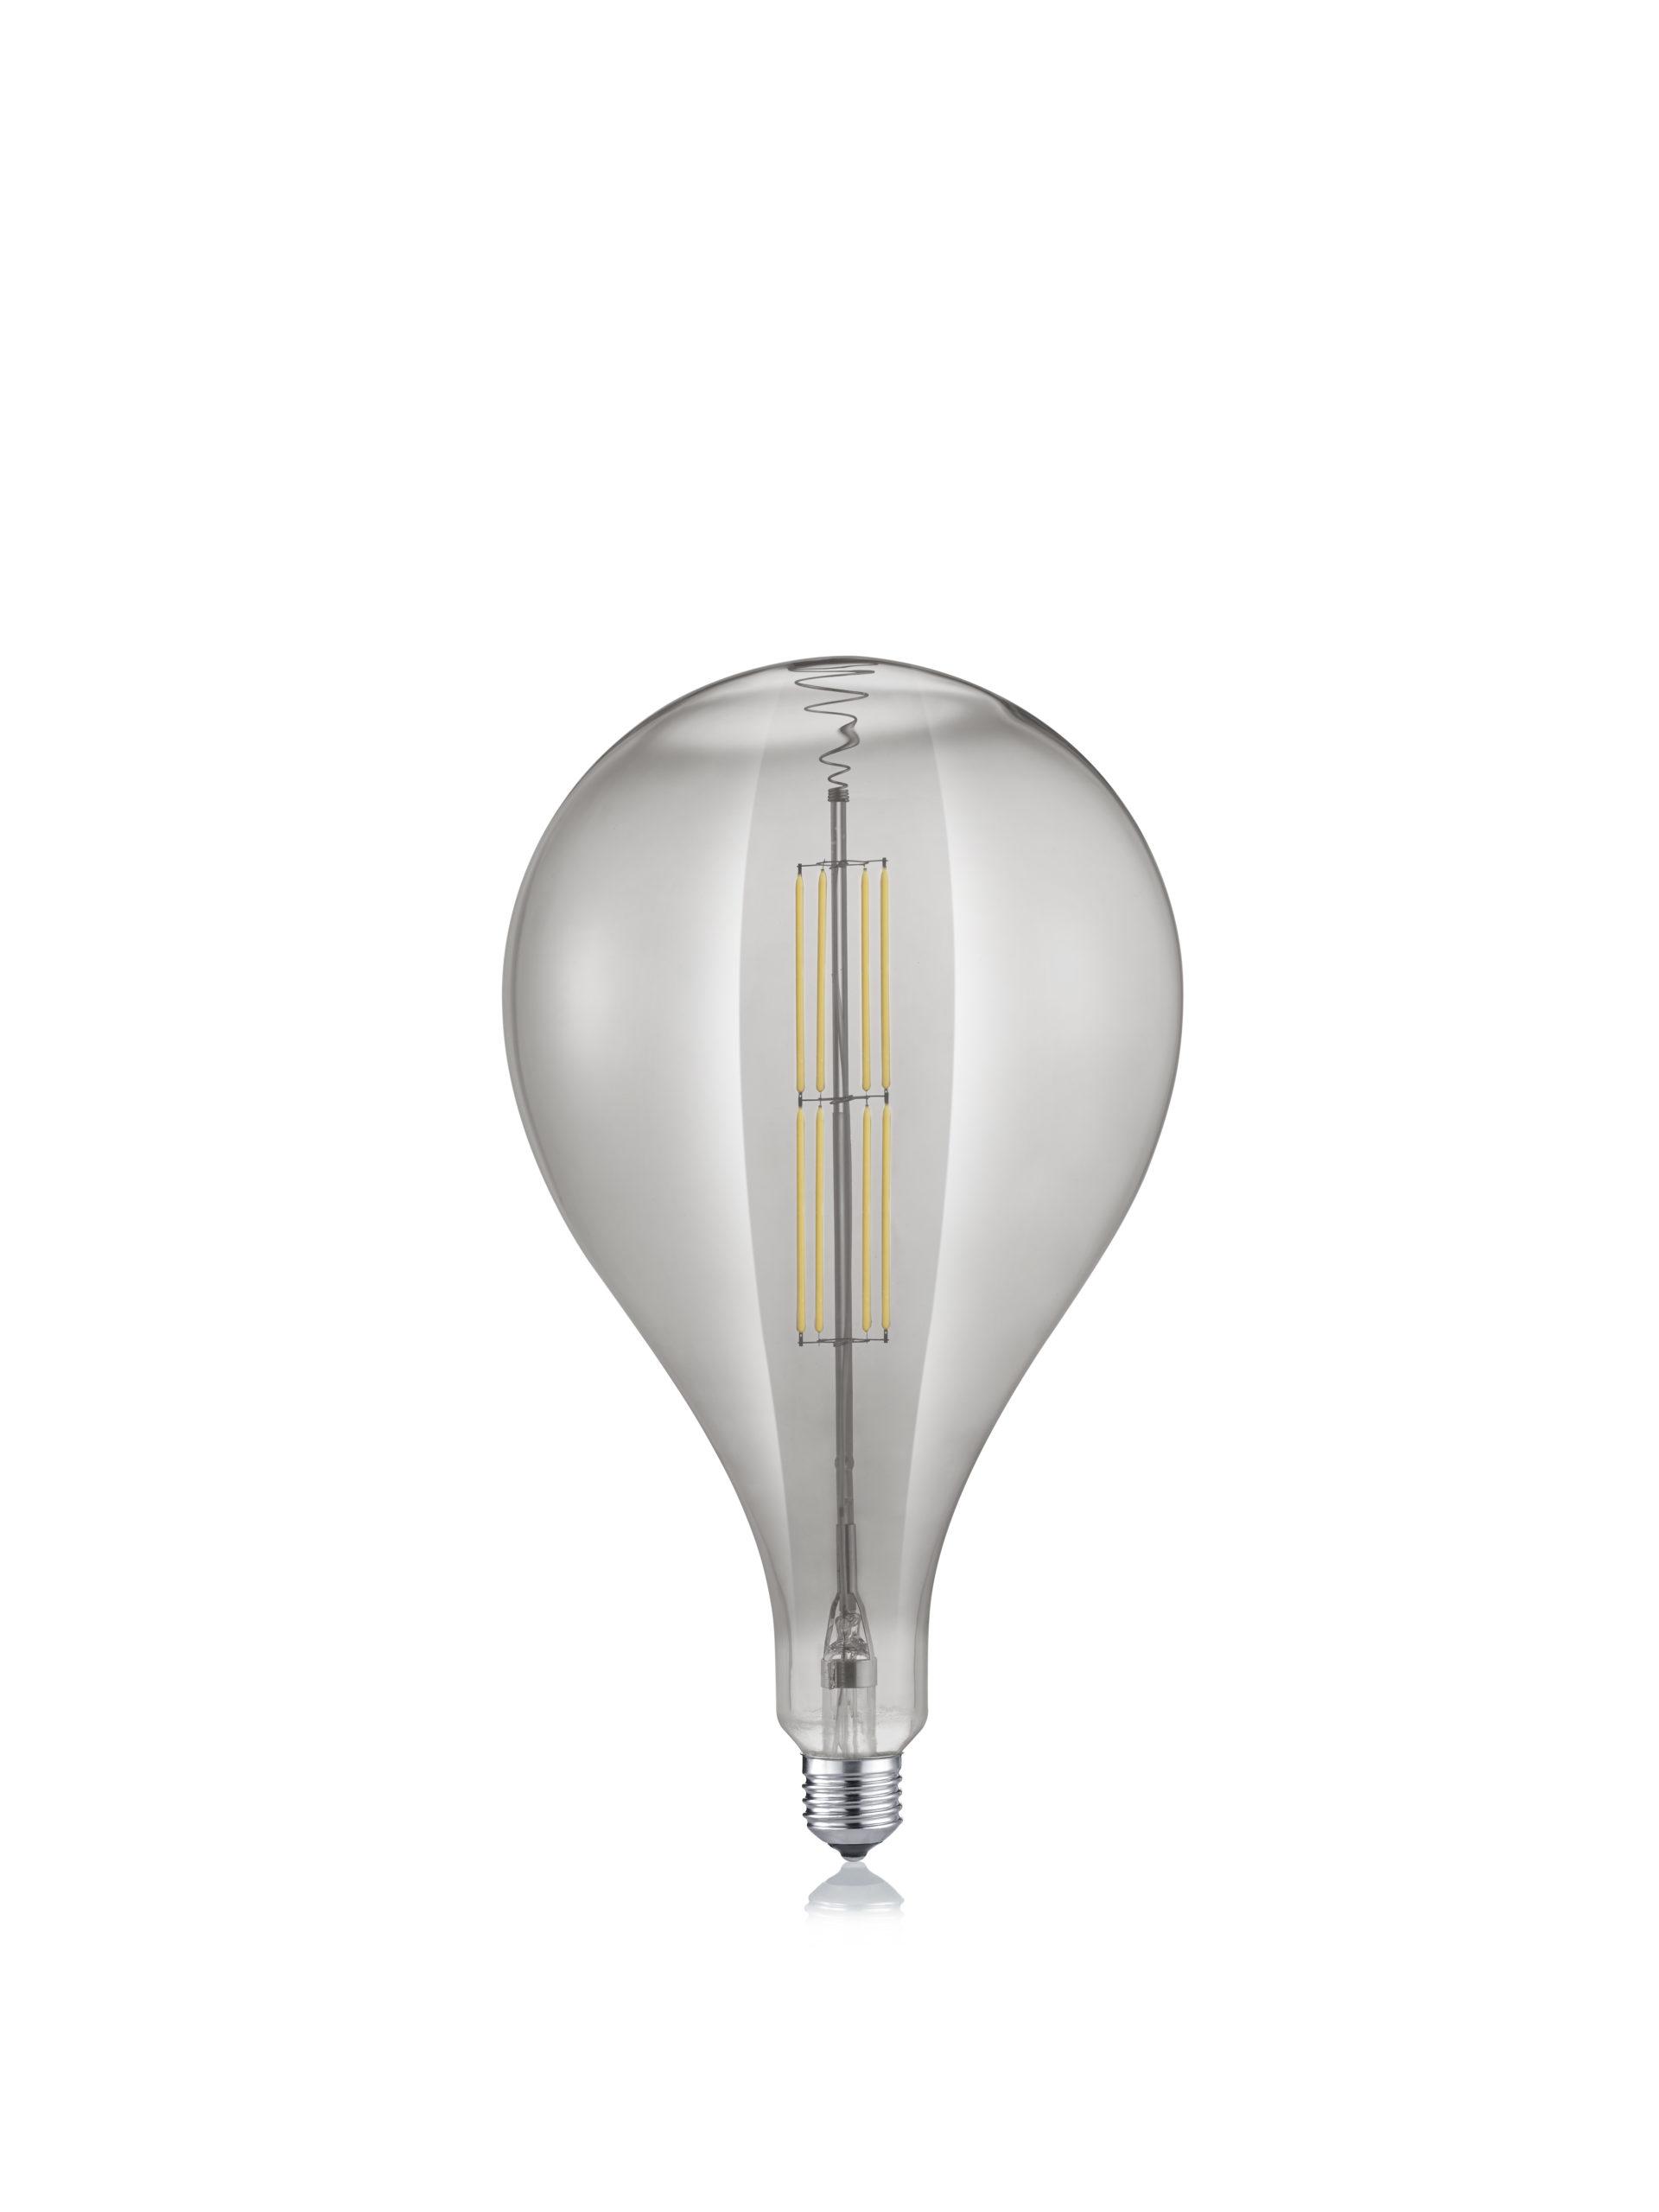 Ampoule LED E27, 8W · 260lm, 2700K GLOBE